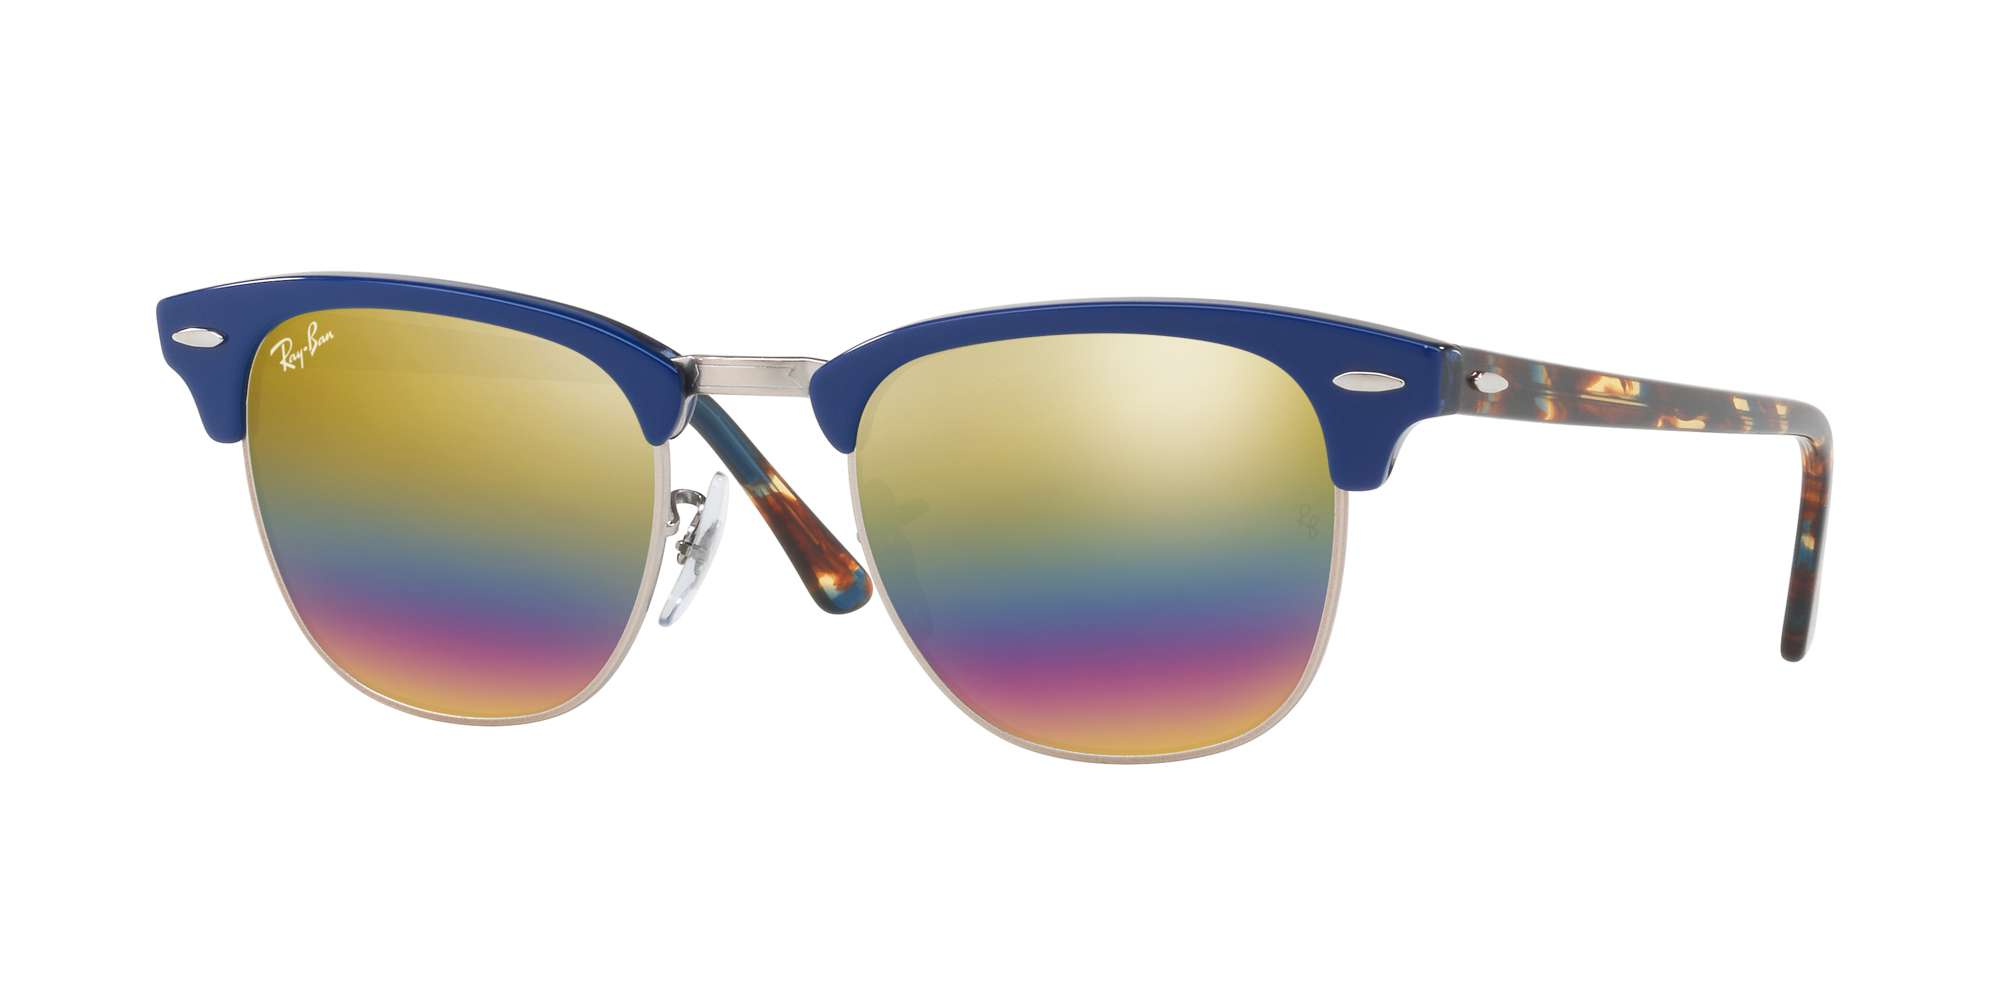 METALLIC LIGHT BRONZE / GREY MIRROR RAINBOW 3 lenses